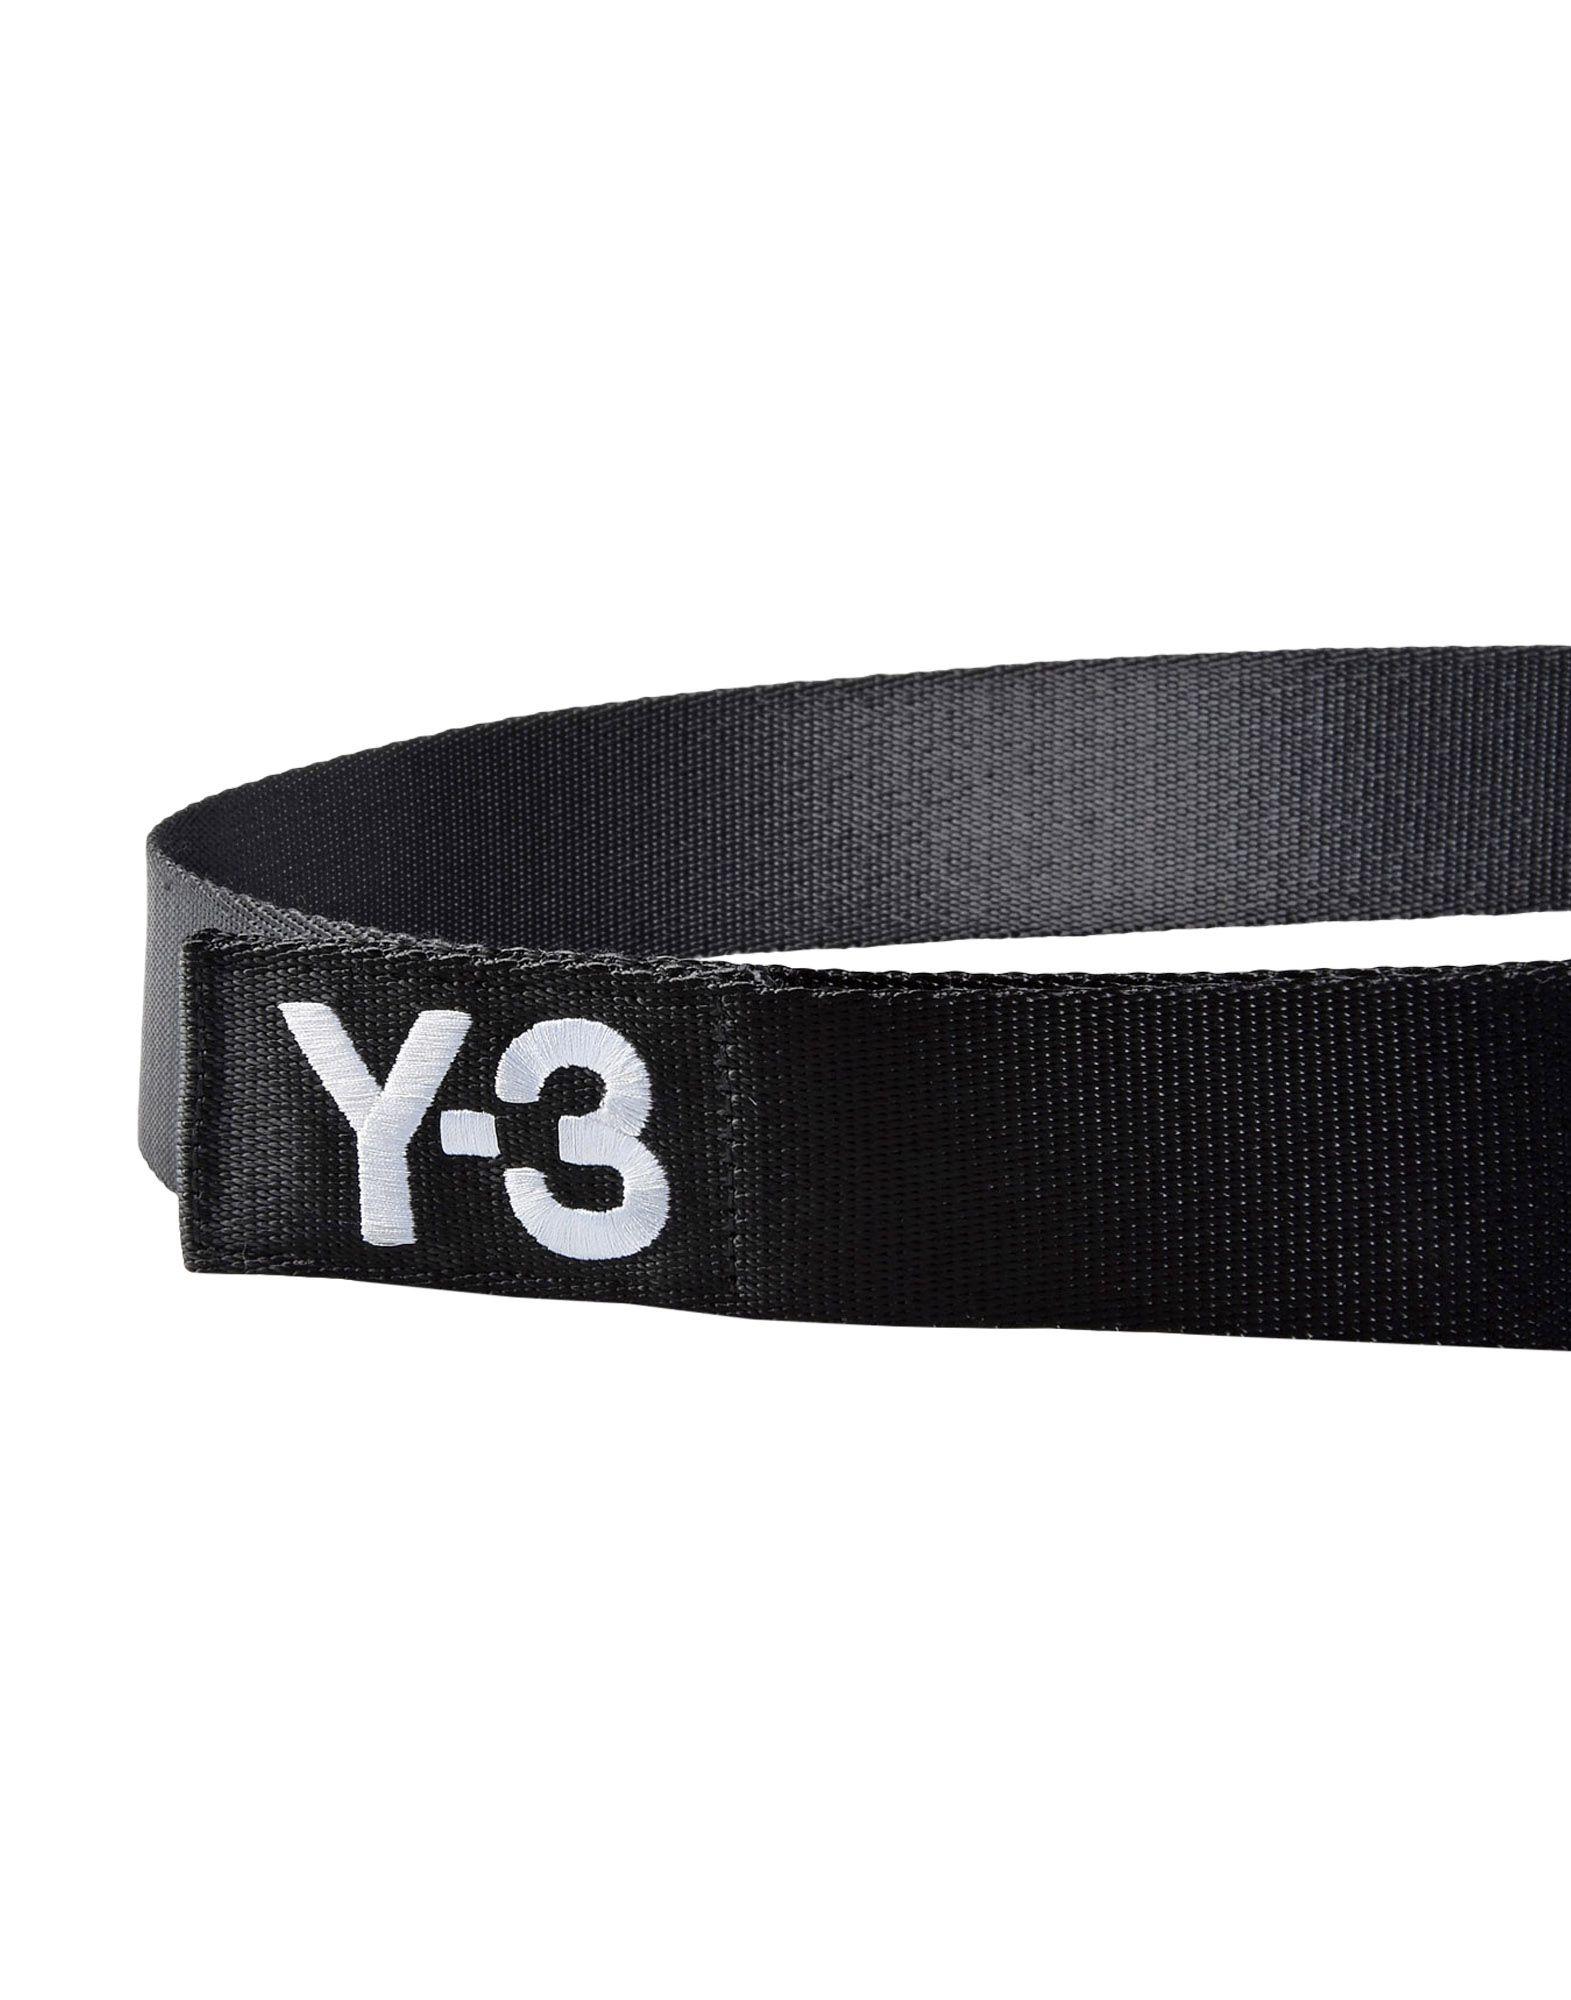 Y-3 BLACK BELT OTHER ACCESSORIES unisex Y-3 adidas